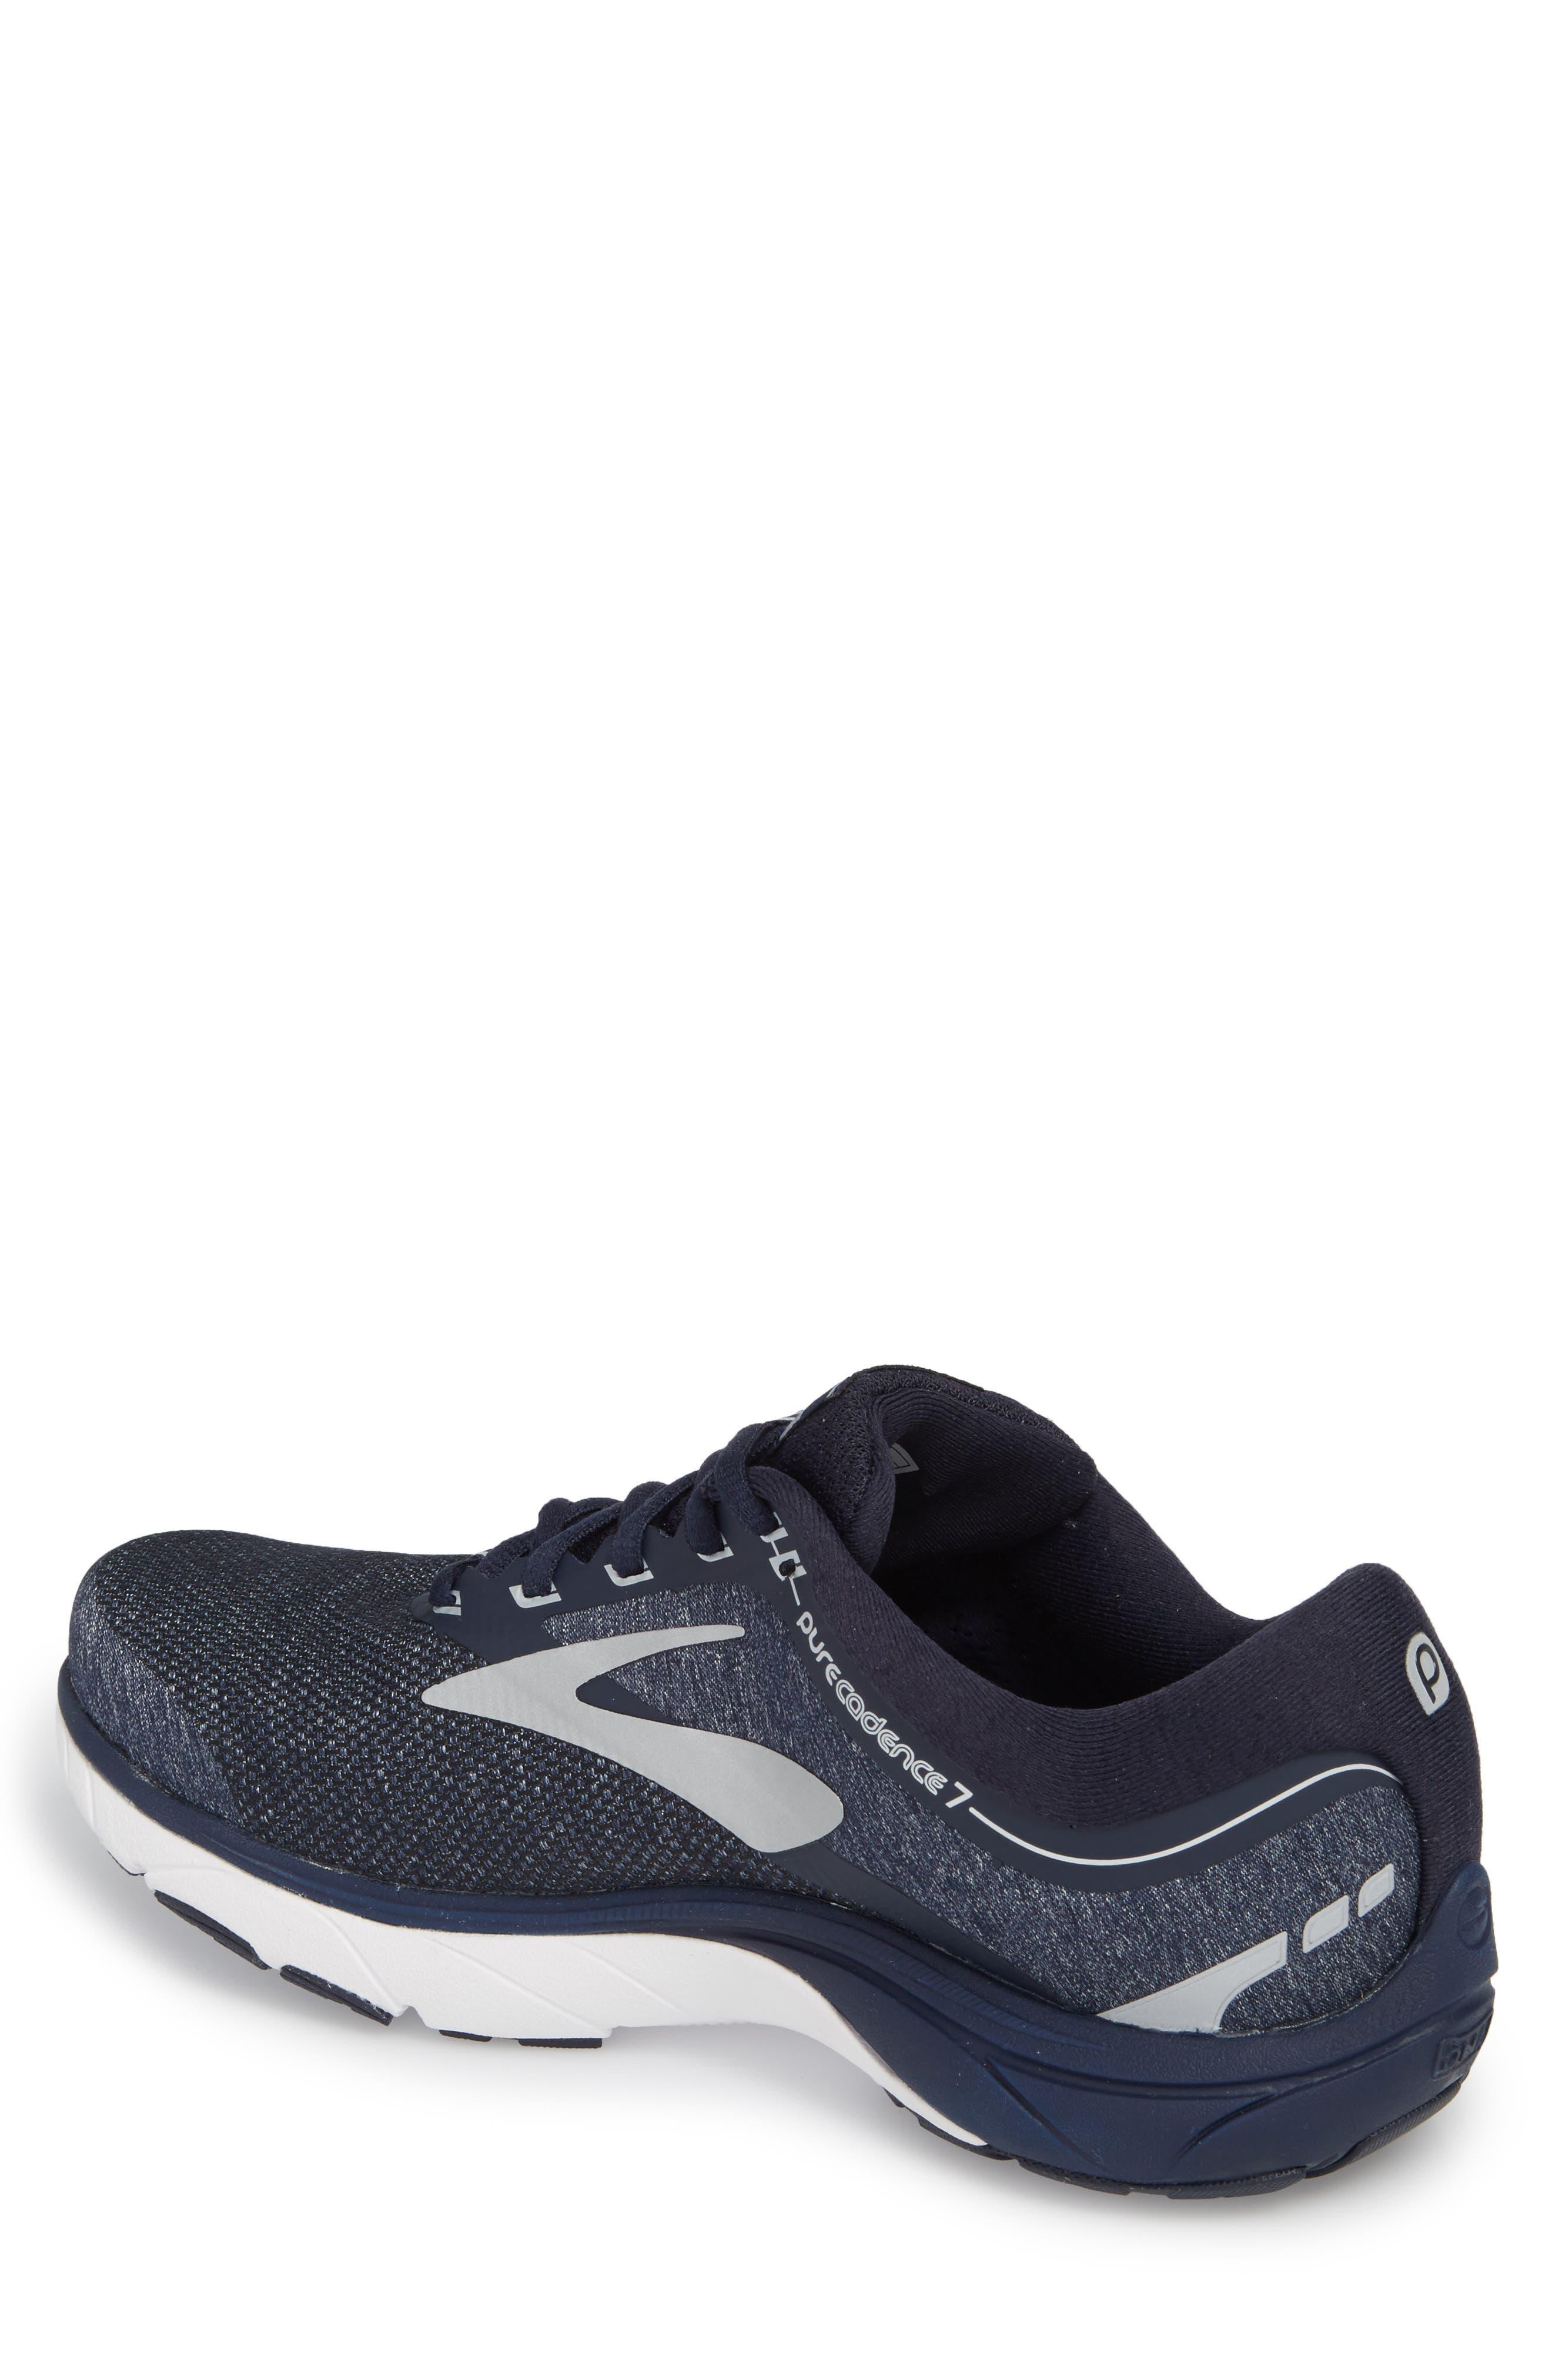 PureCadence 7 Road Running Shoe,                             Alternate thumbnail 2, color,                             Peacoat/ Silver/ White